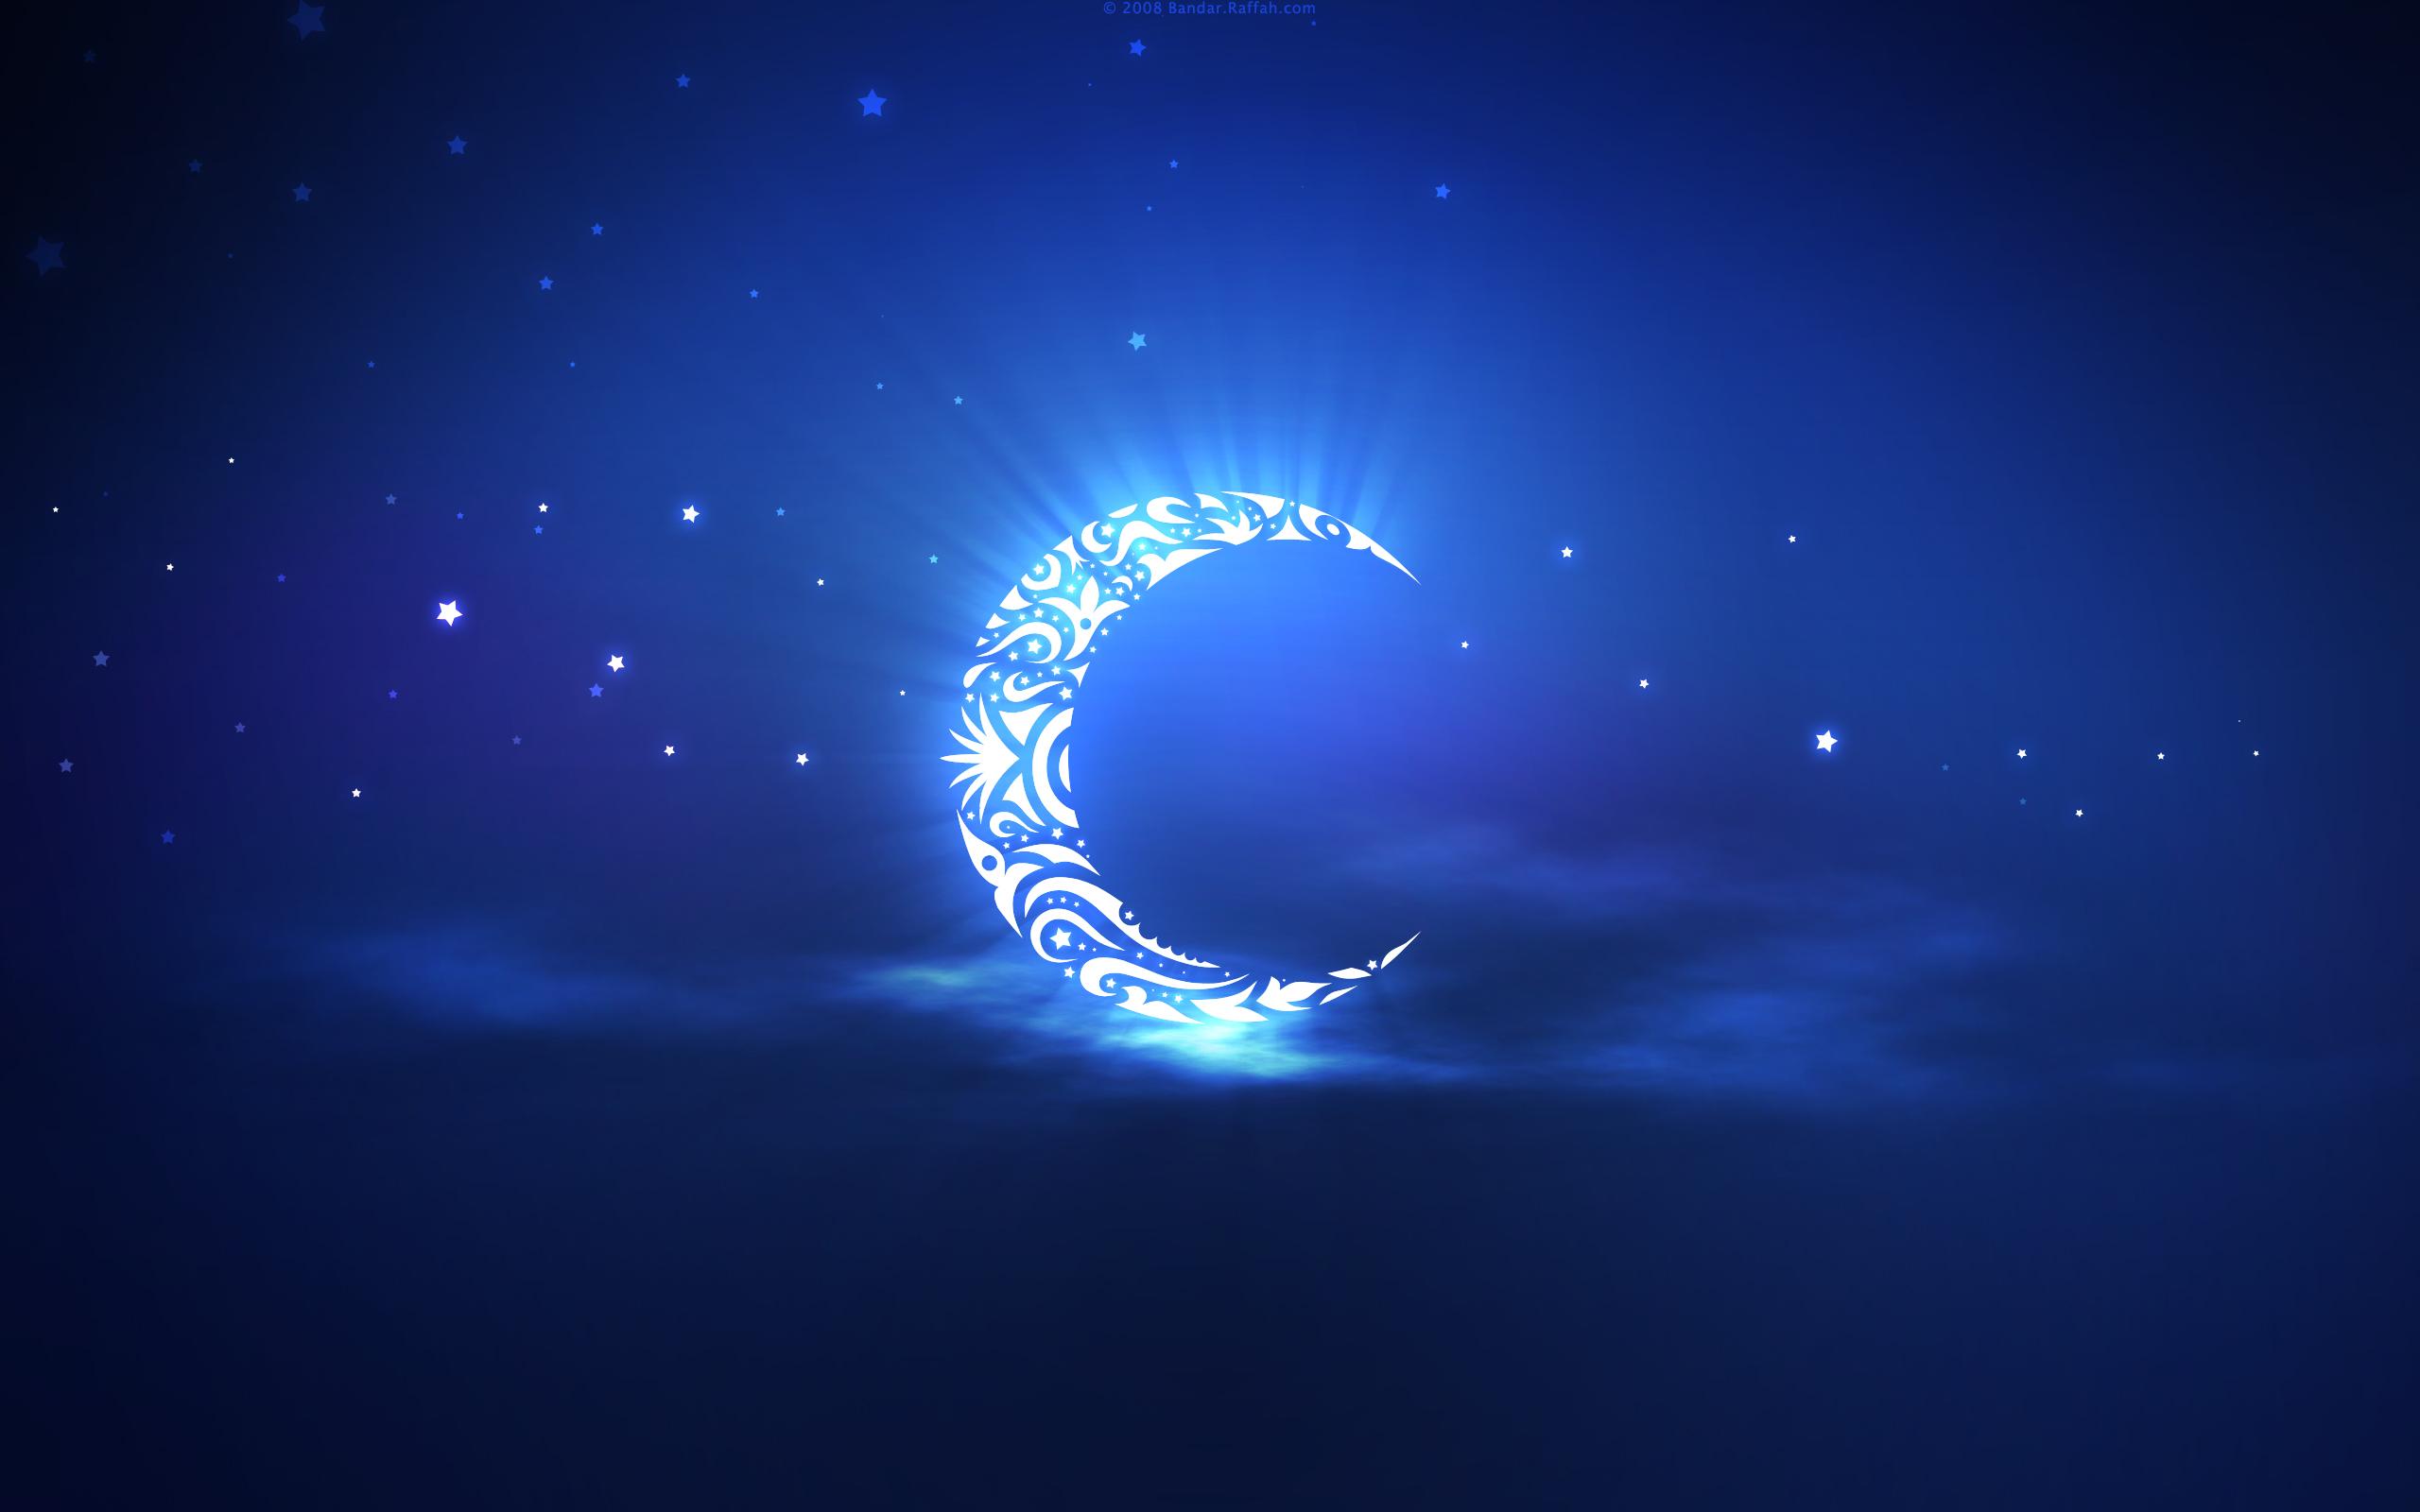 http://www.therevival.co.uk/sites/default/files/08-Ramadan-Kareem-Wallpaper.jpg